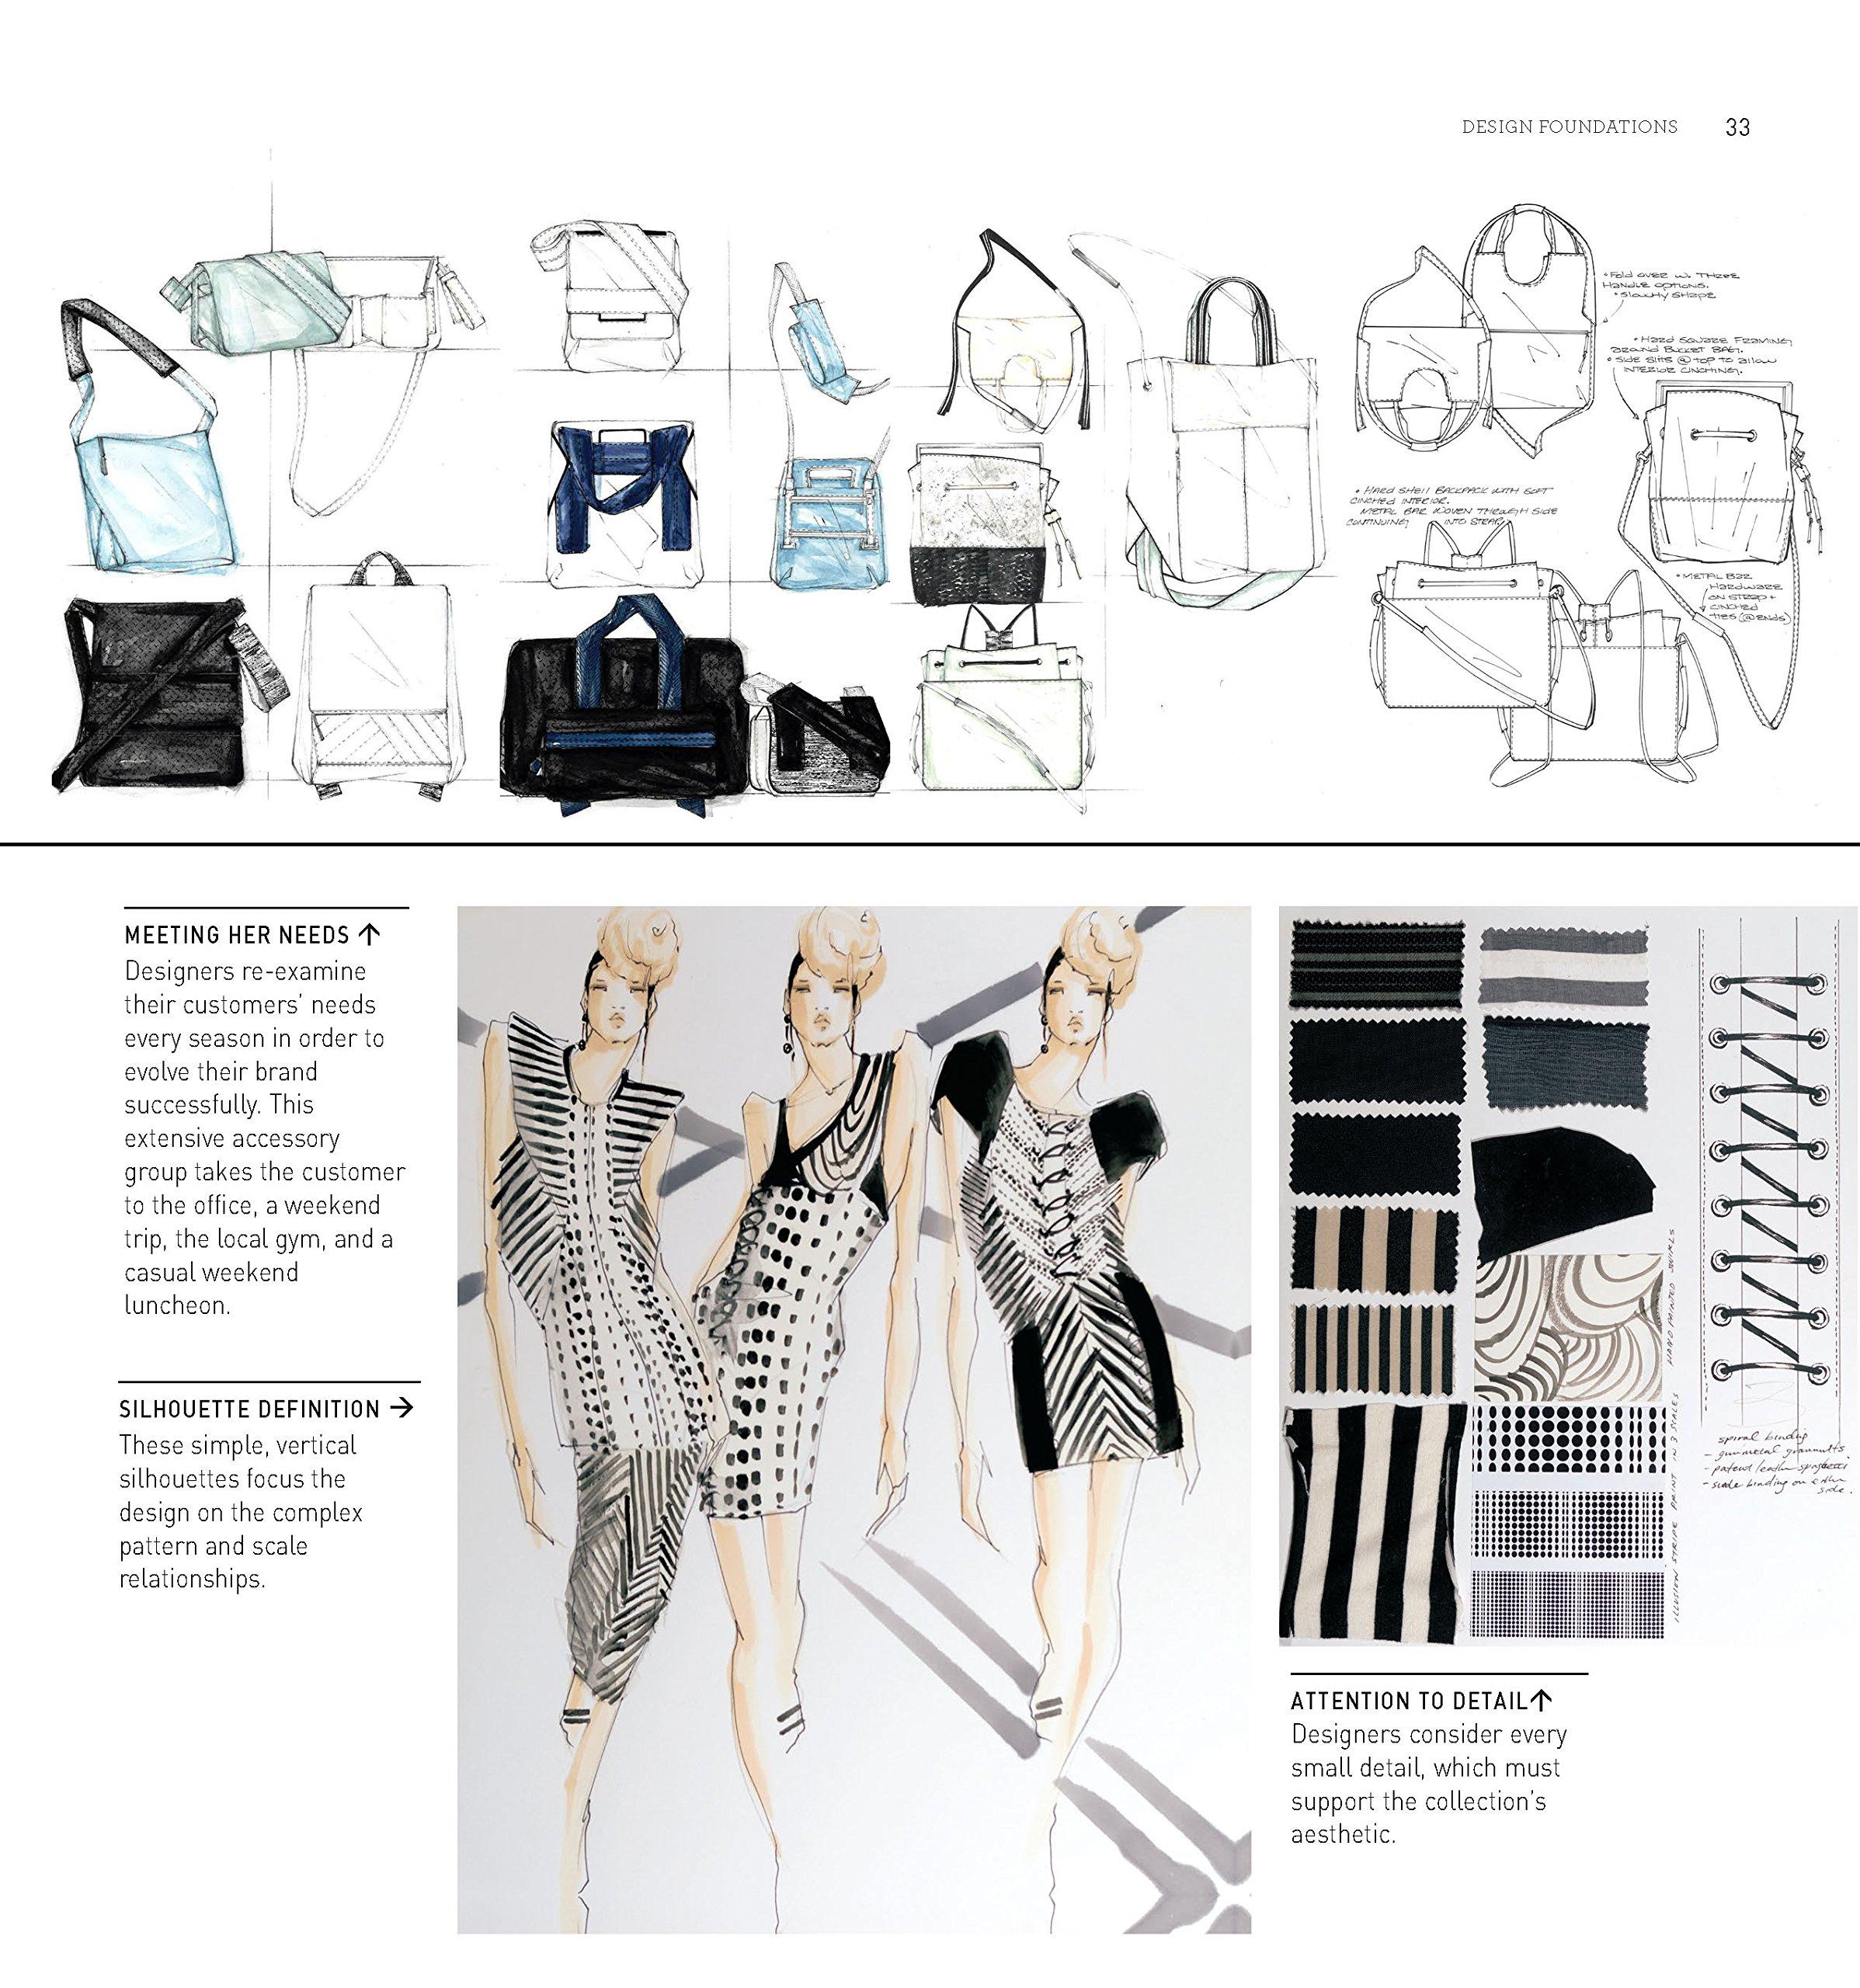 Fashion Design Course Principles Practice And Techniques The Practical Guide For Aspiring Fashion Designers Faerm Steven 9781438011073 Books Amazon Ca